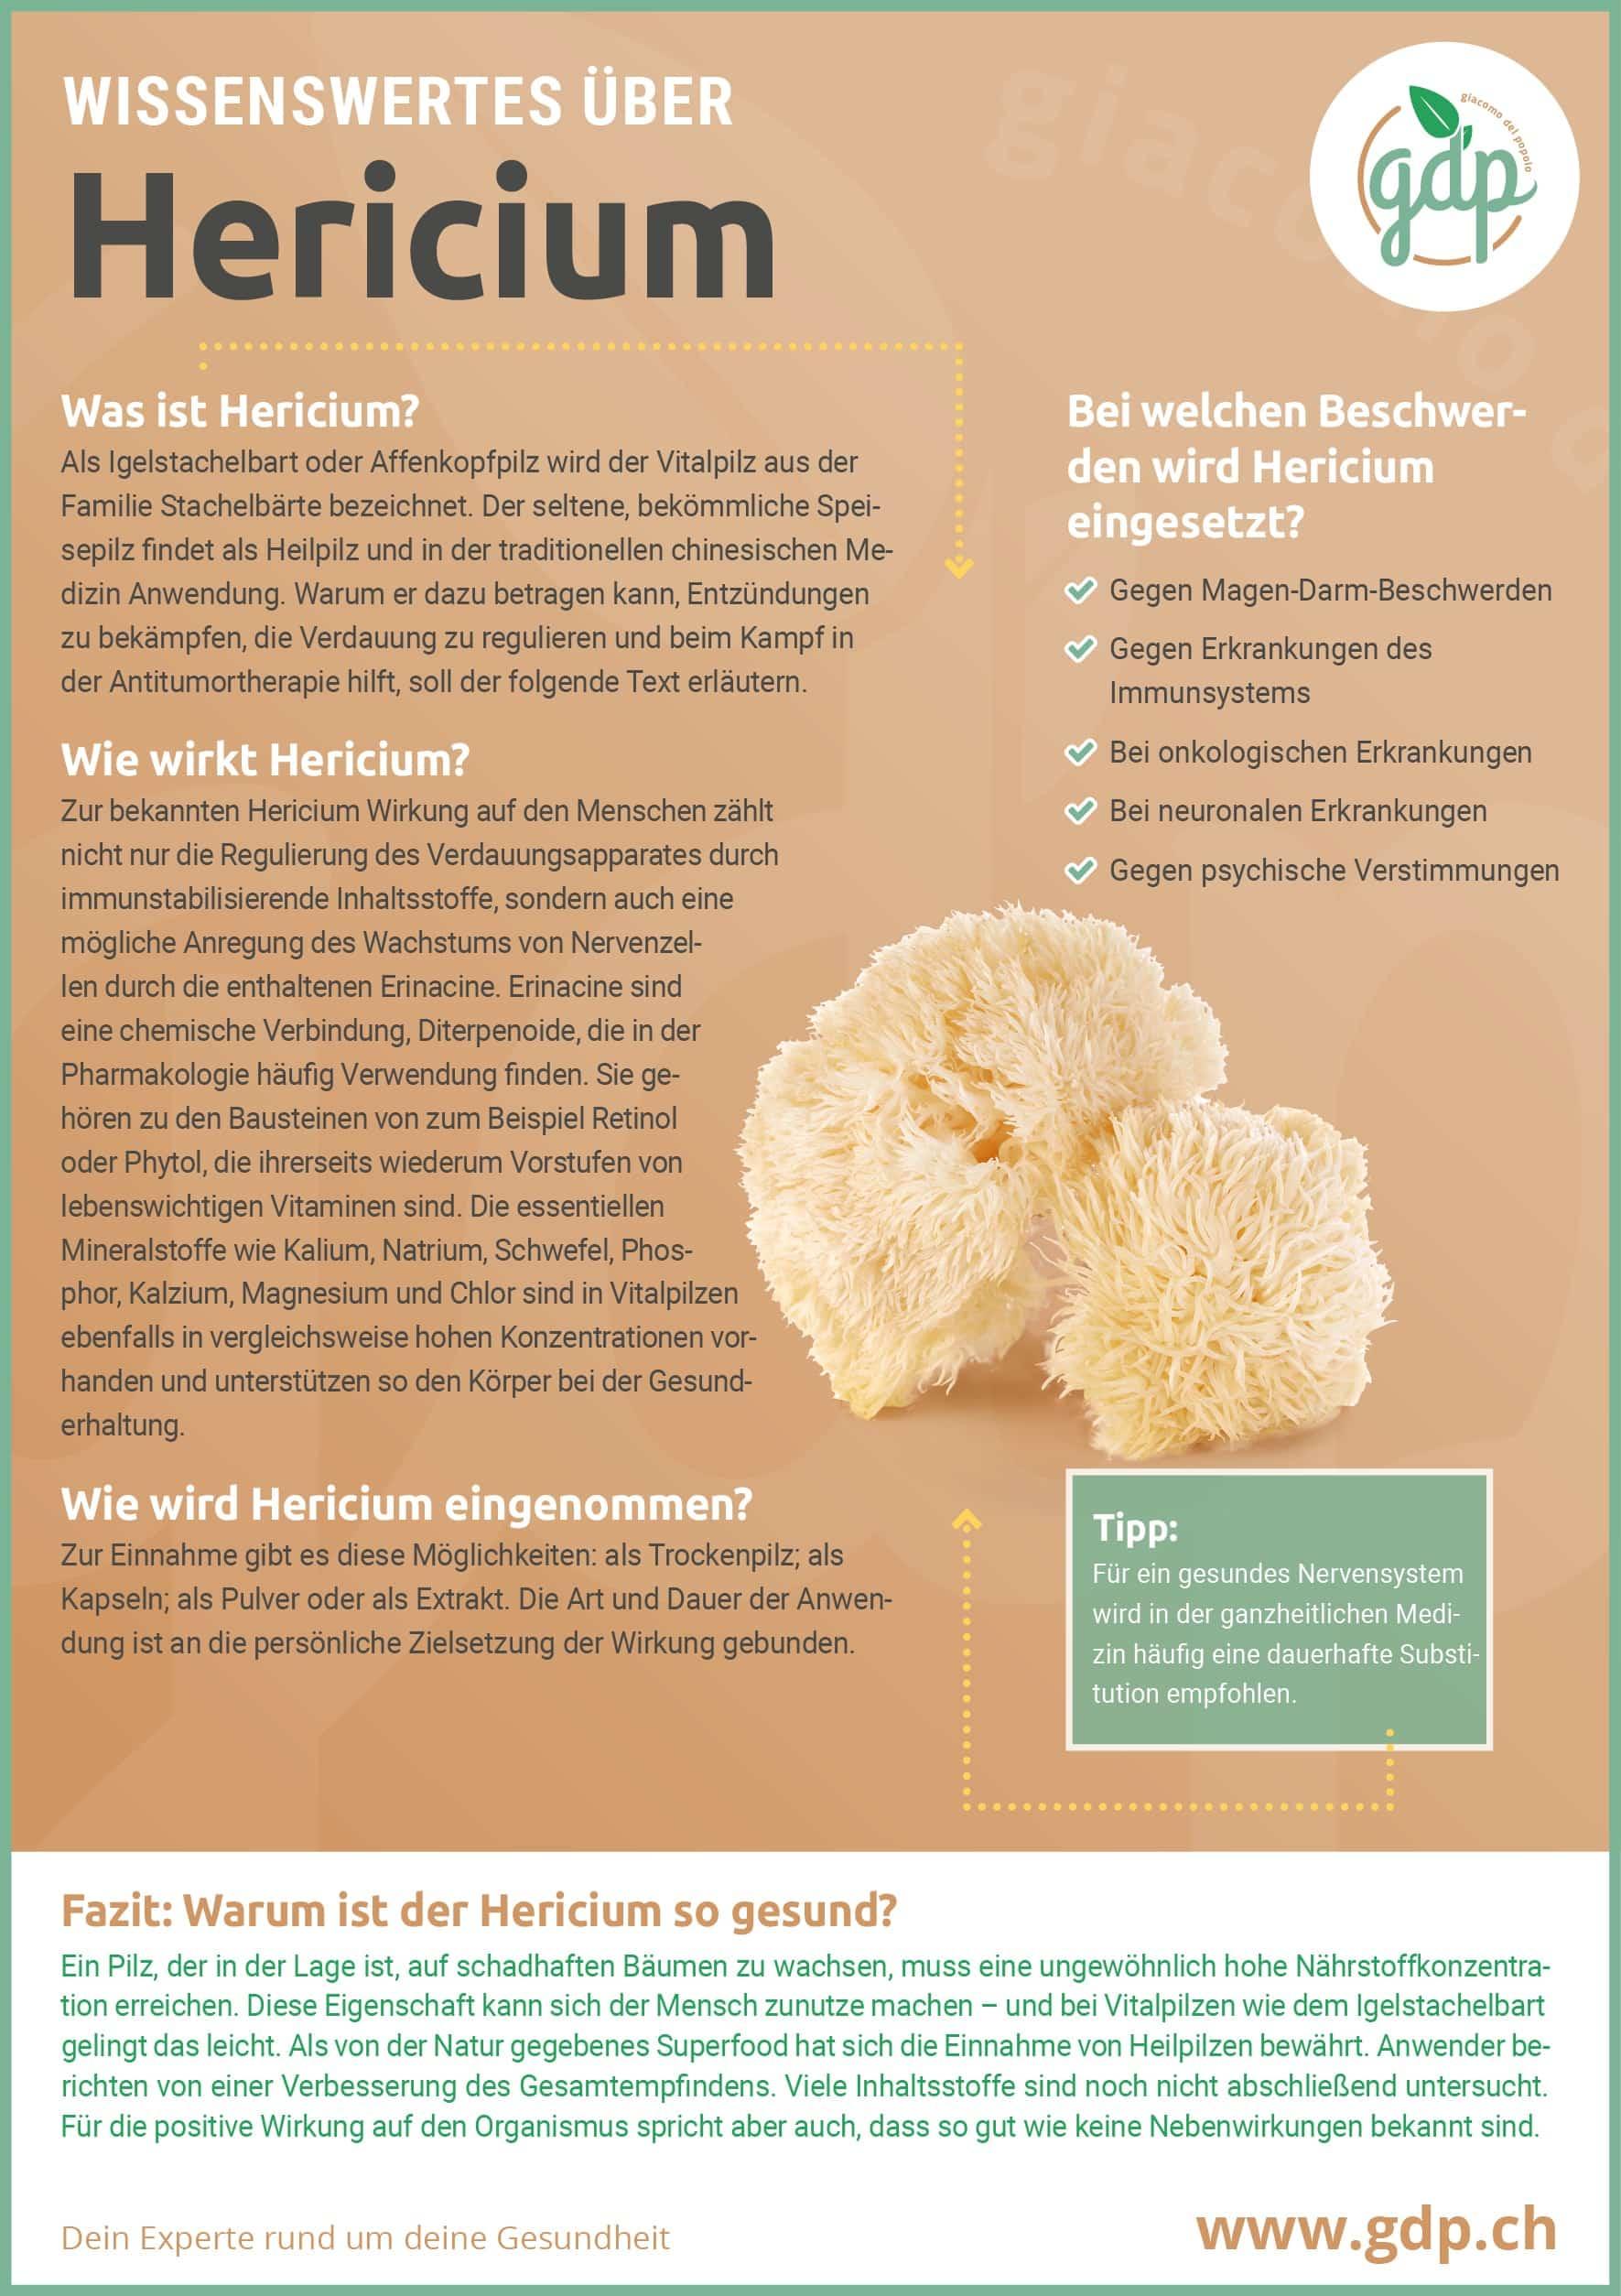 Hericium gdp Infografik